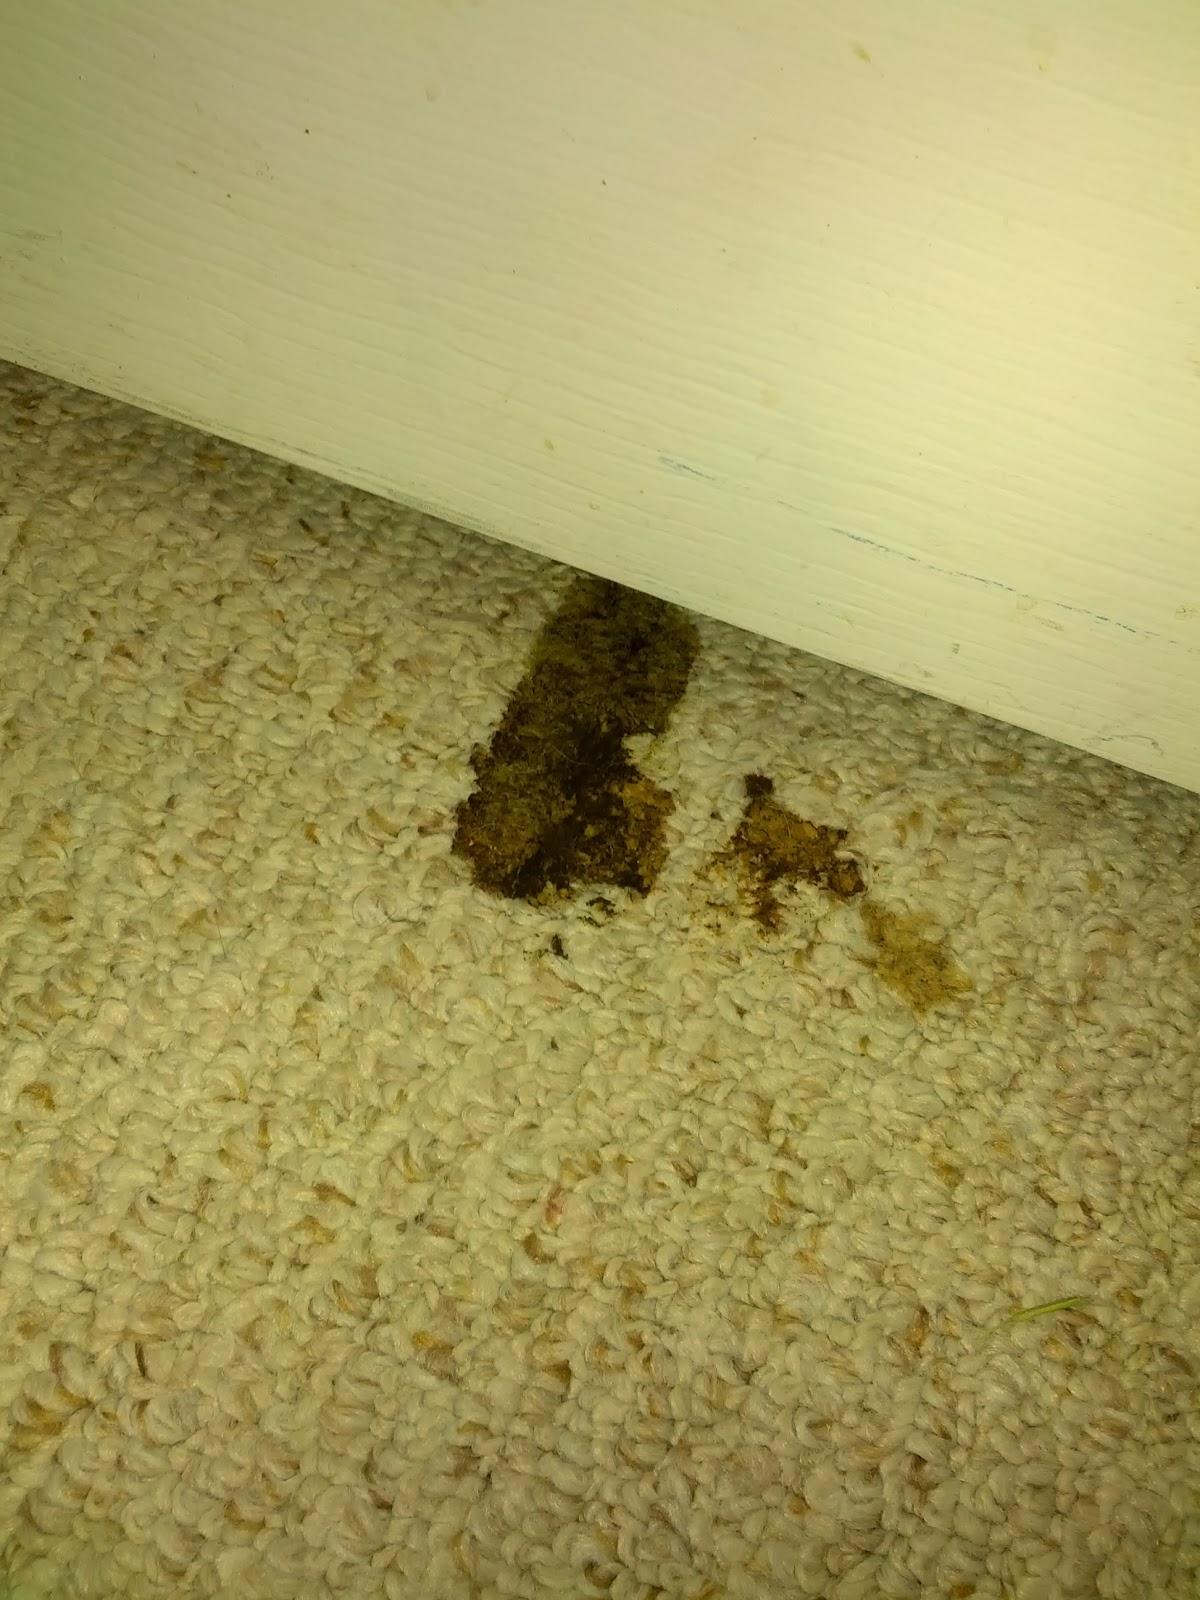 Clean Dog Diarrhea Out Of Carpet Carpet Vidalondon